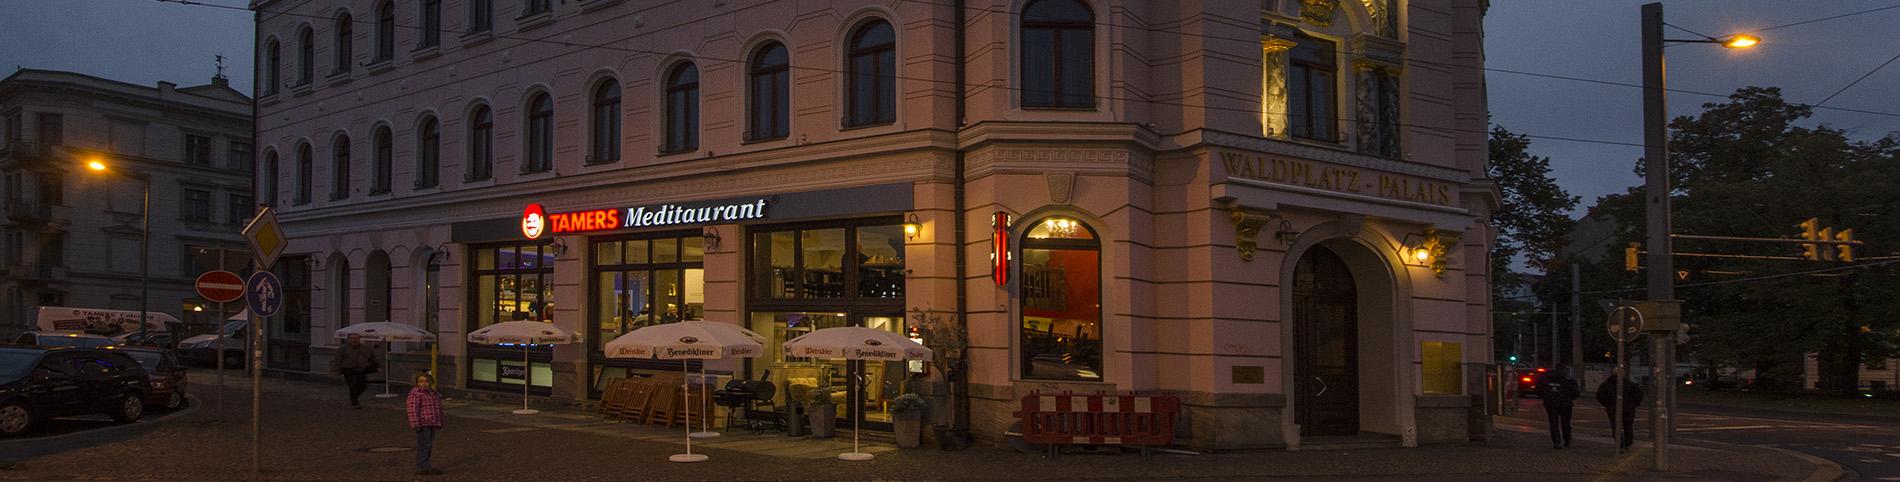 TAMERS® Meditaurant, Örs Gastro GmbH; Foto: Andreas Reichelt